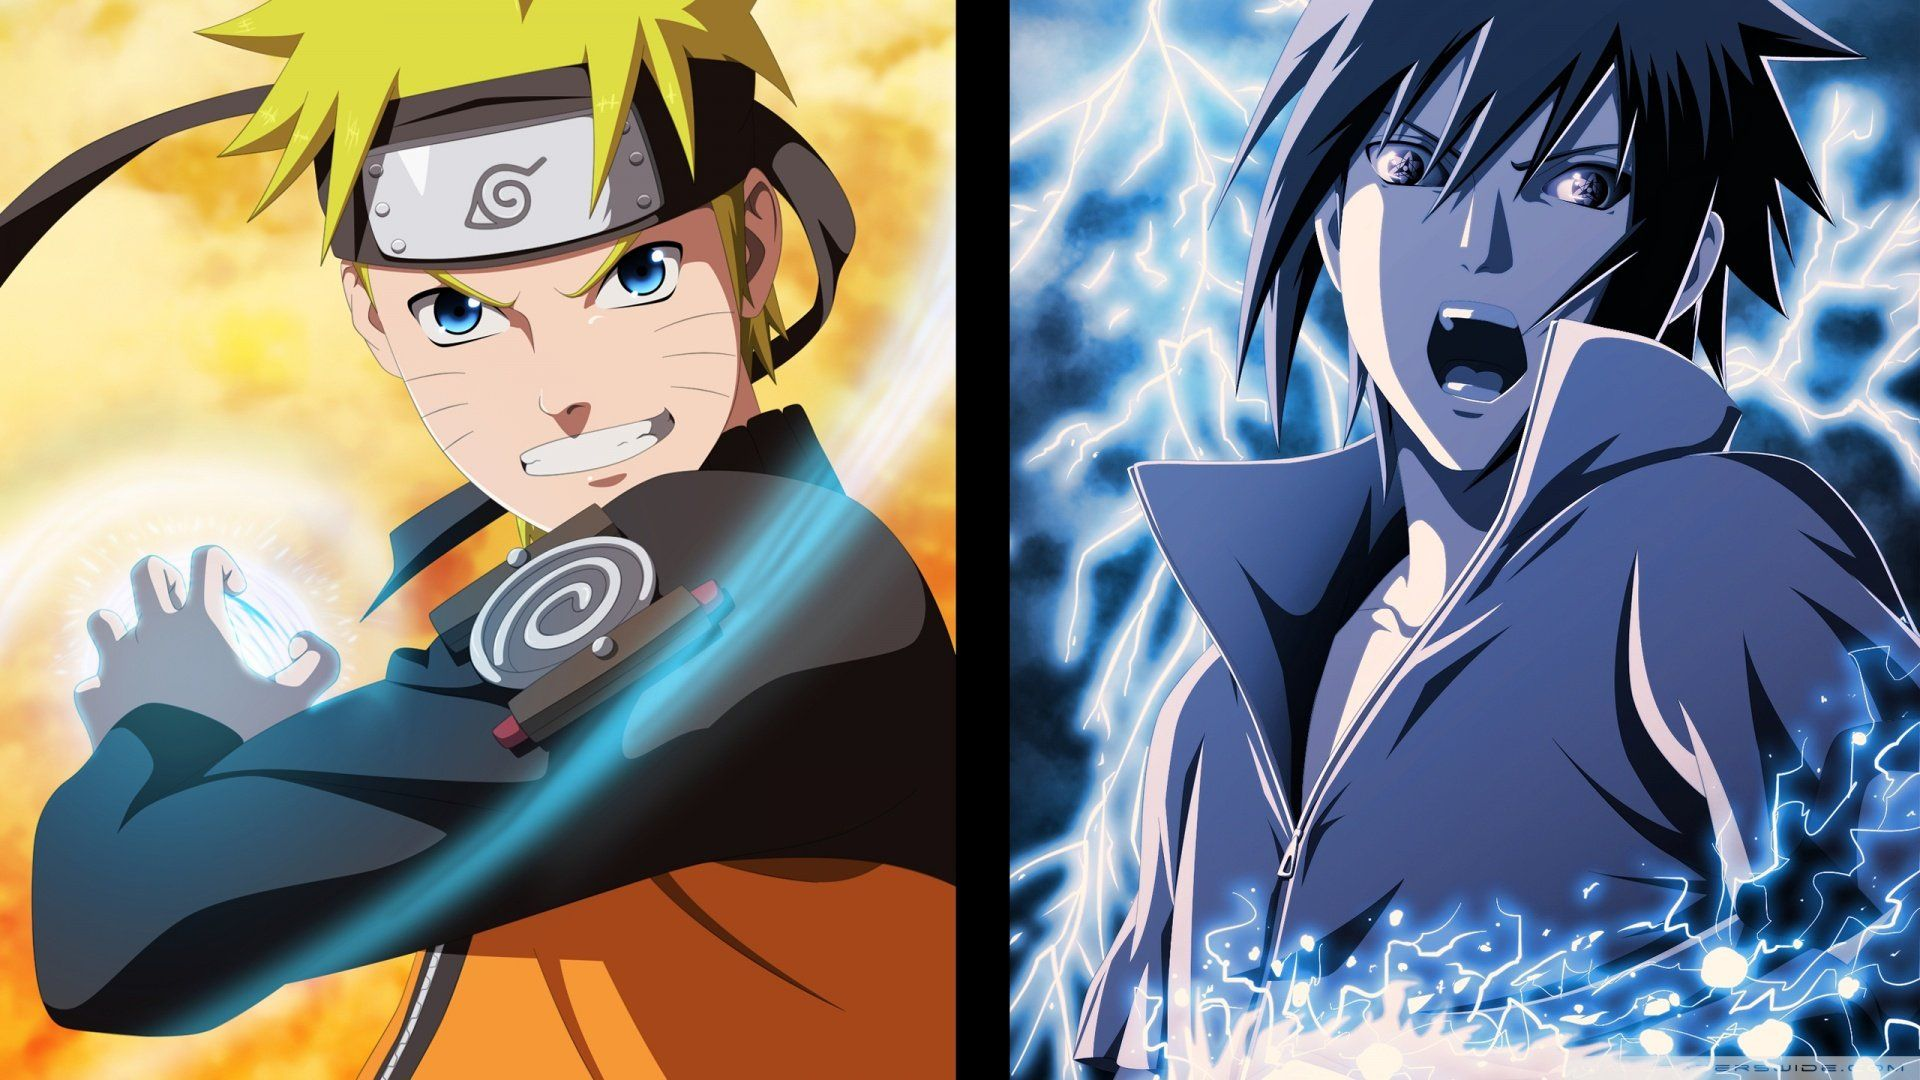 Naruto Vs Sasuke 4k Wallpaper Mobile Click Wallpapers Naruto And Sasuke Wallpaper Naruto Wallpaper Naruto Vs Sasuke